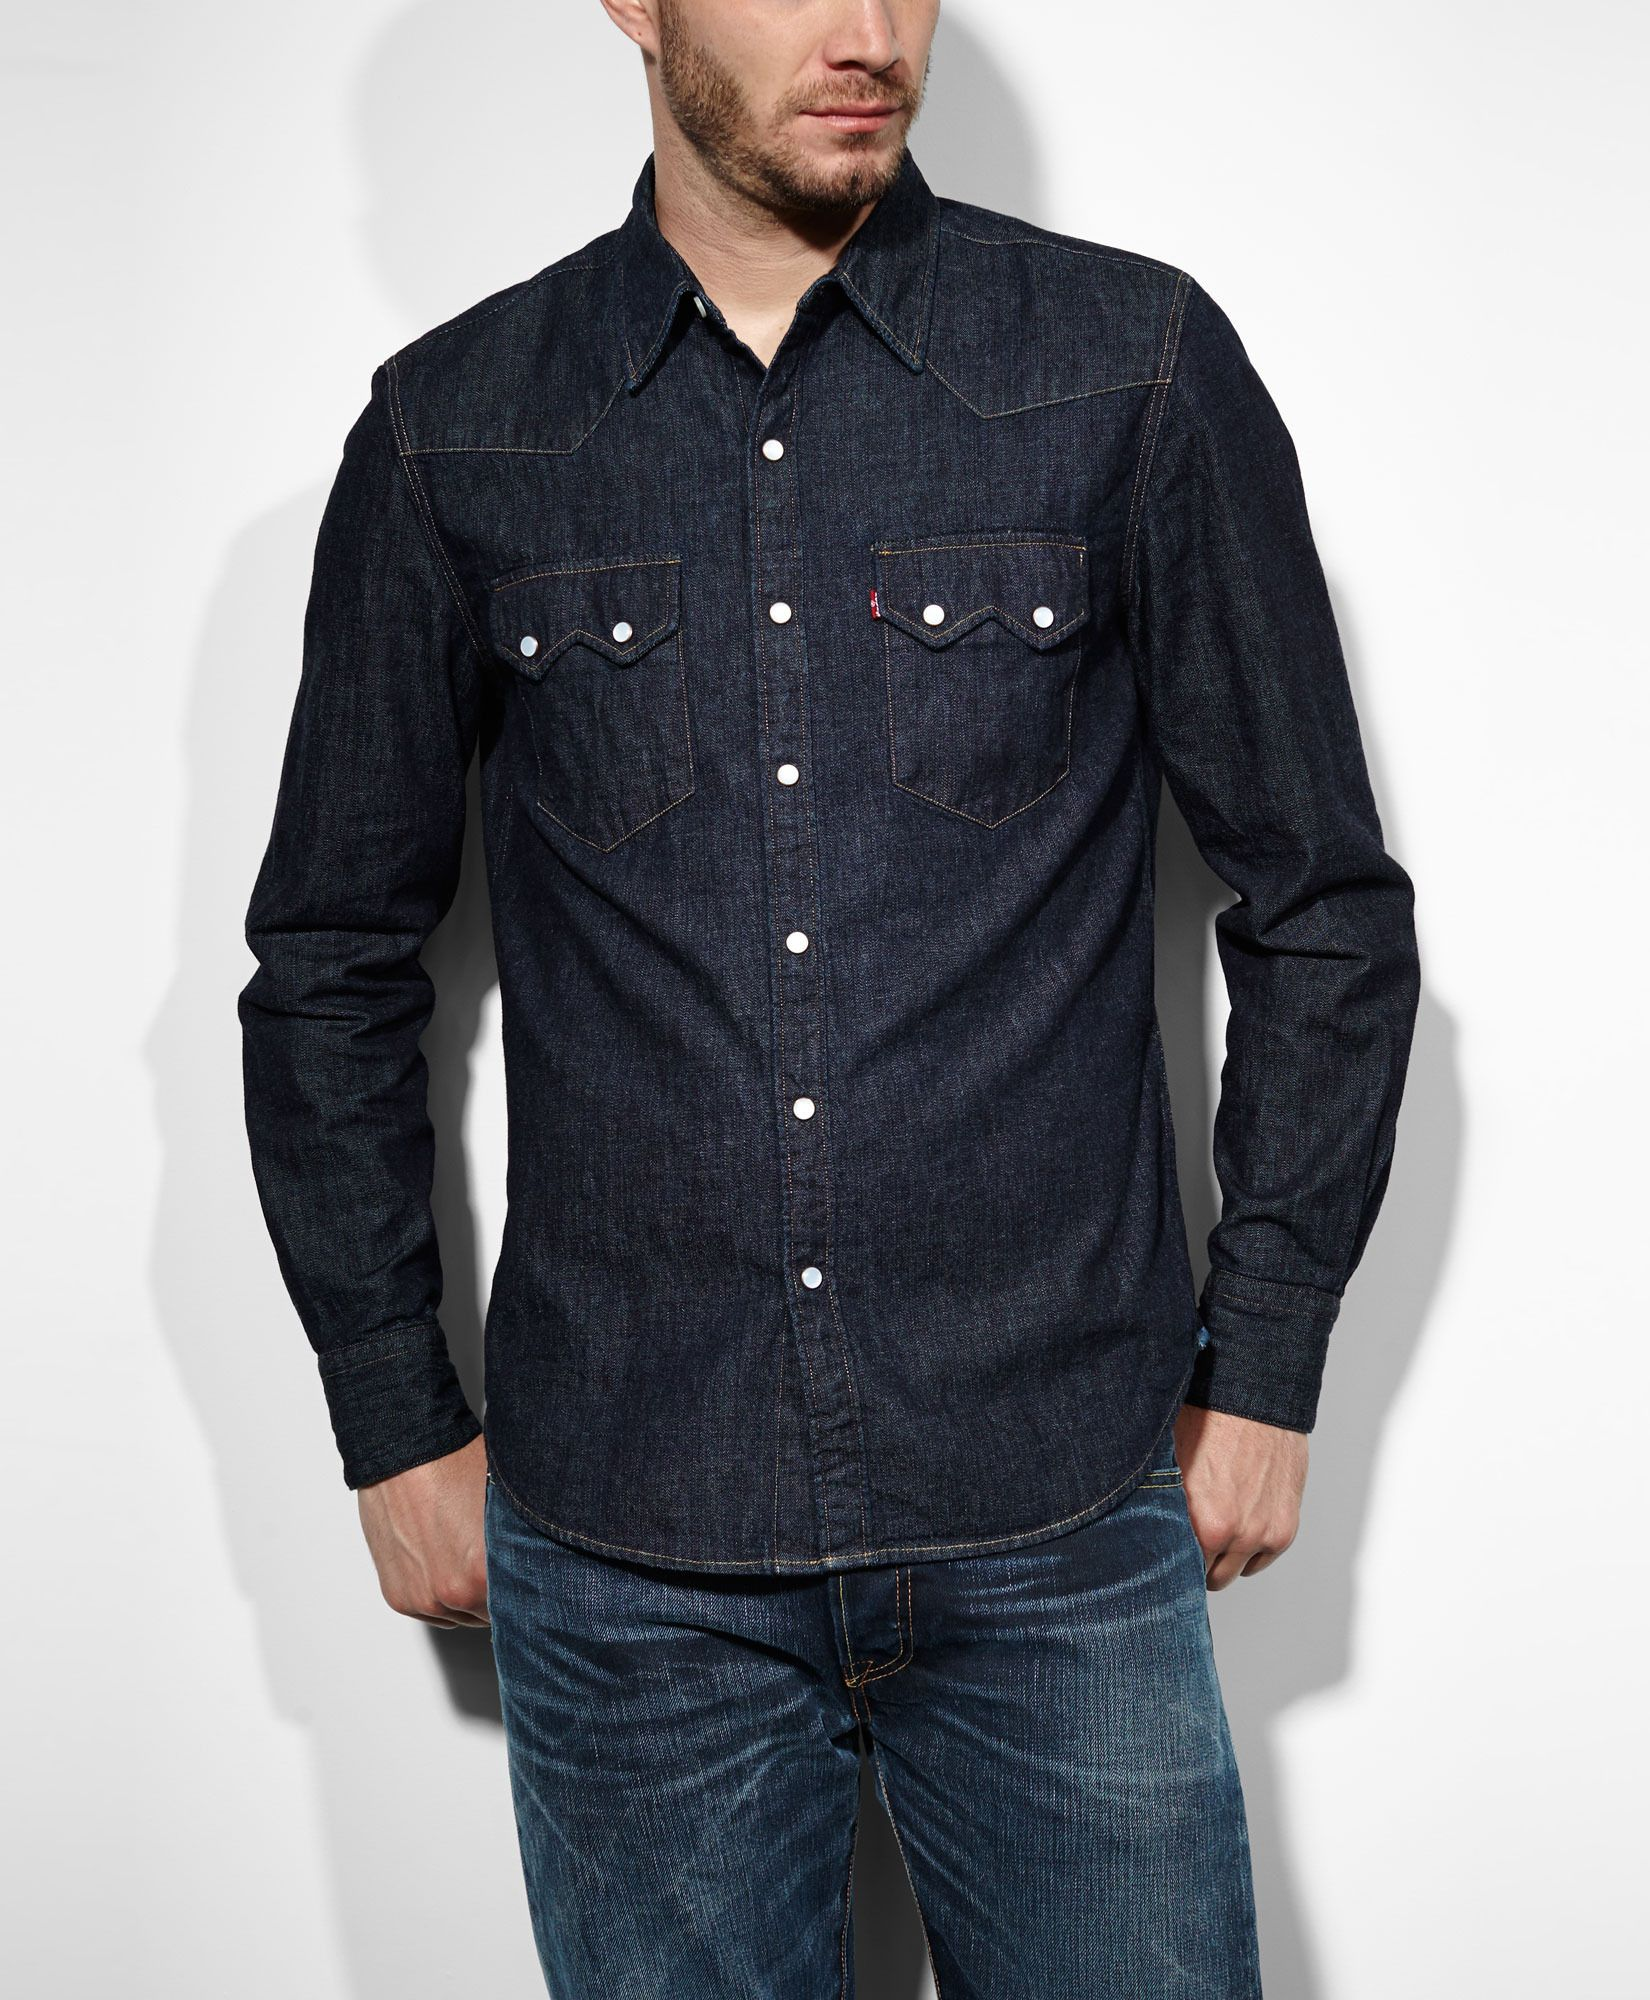 Shirt Sawtooth SleeveShirts Western Rigid Levi's Long dhCtsQrx